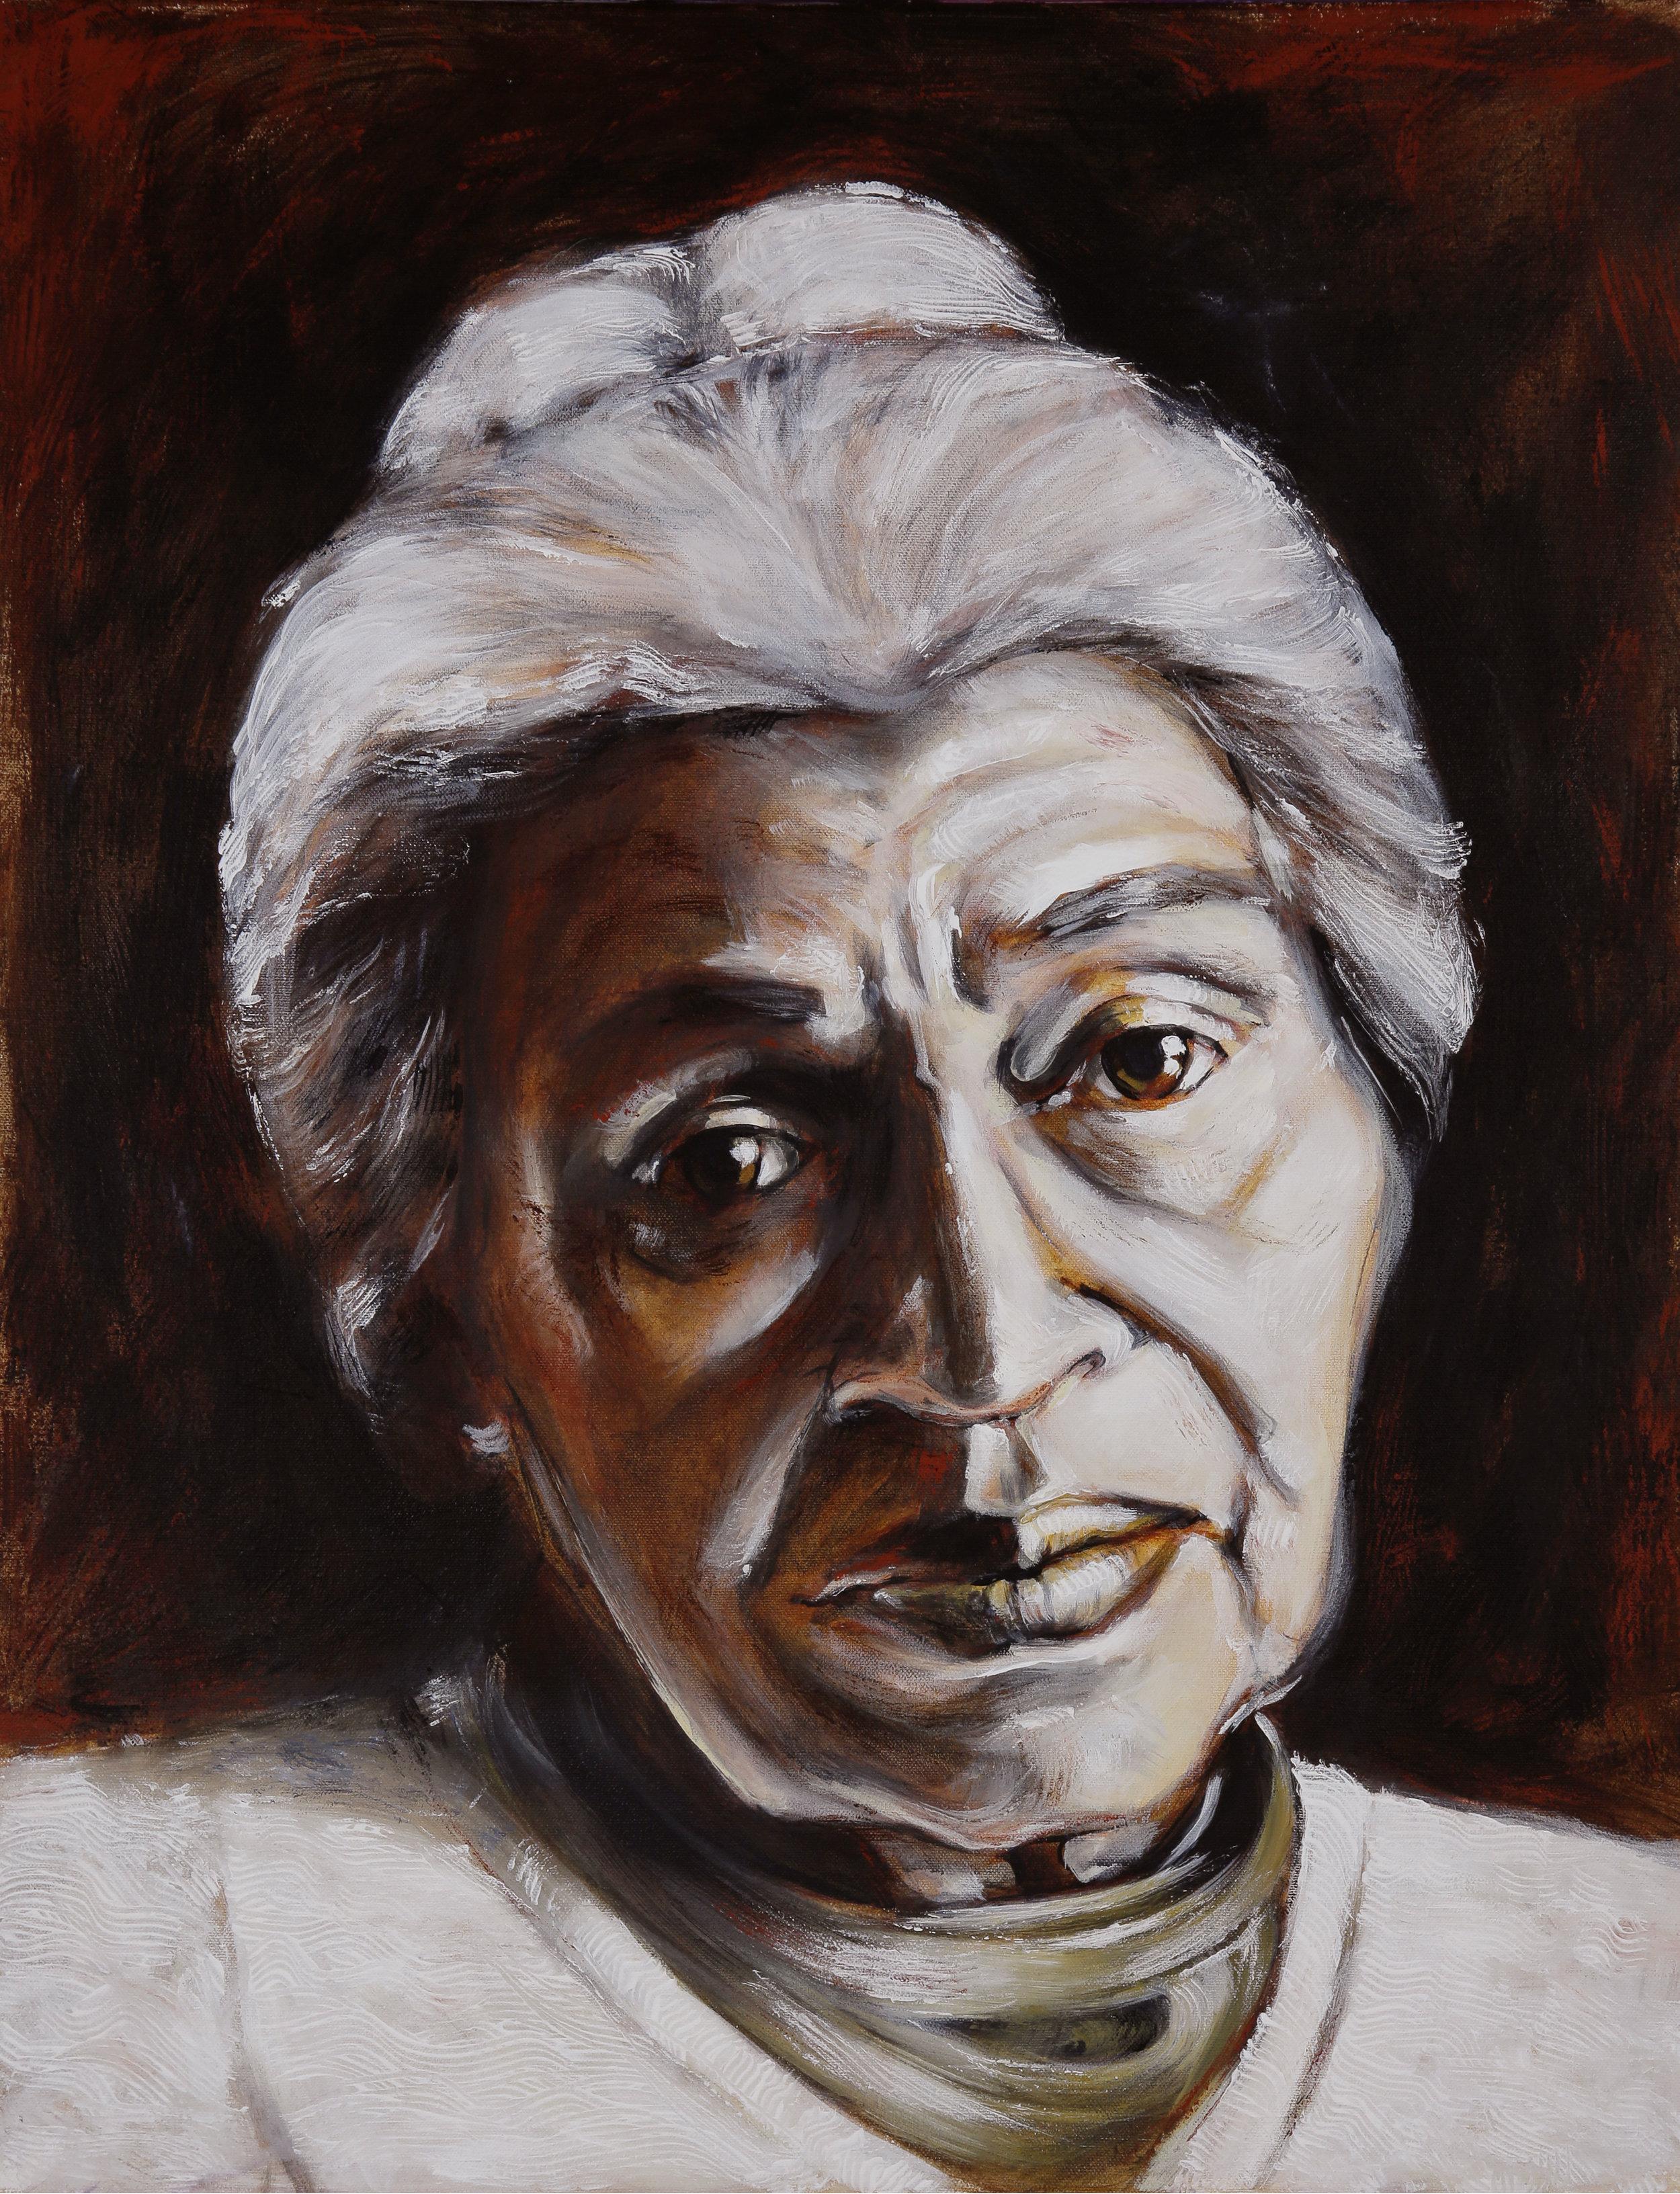 Rosa Parks Tribute